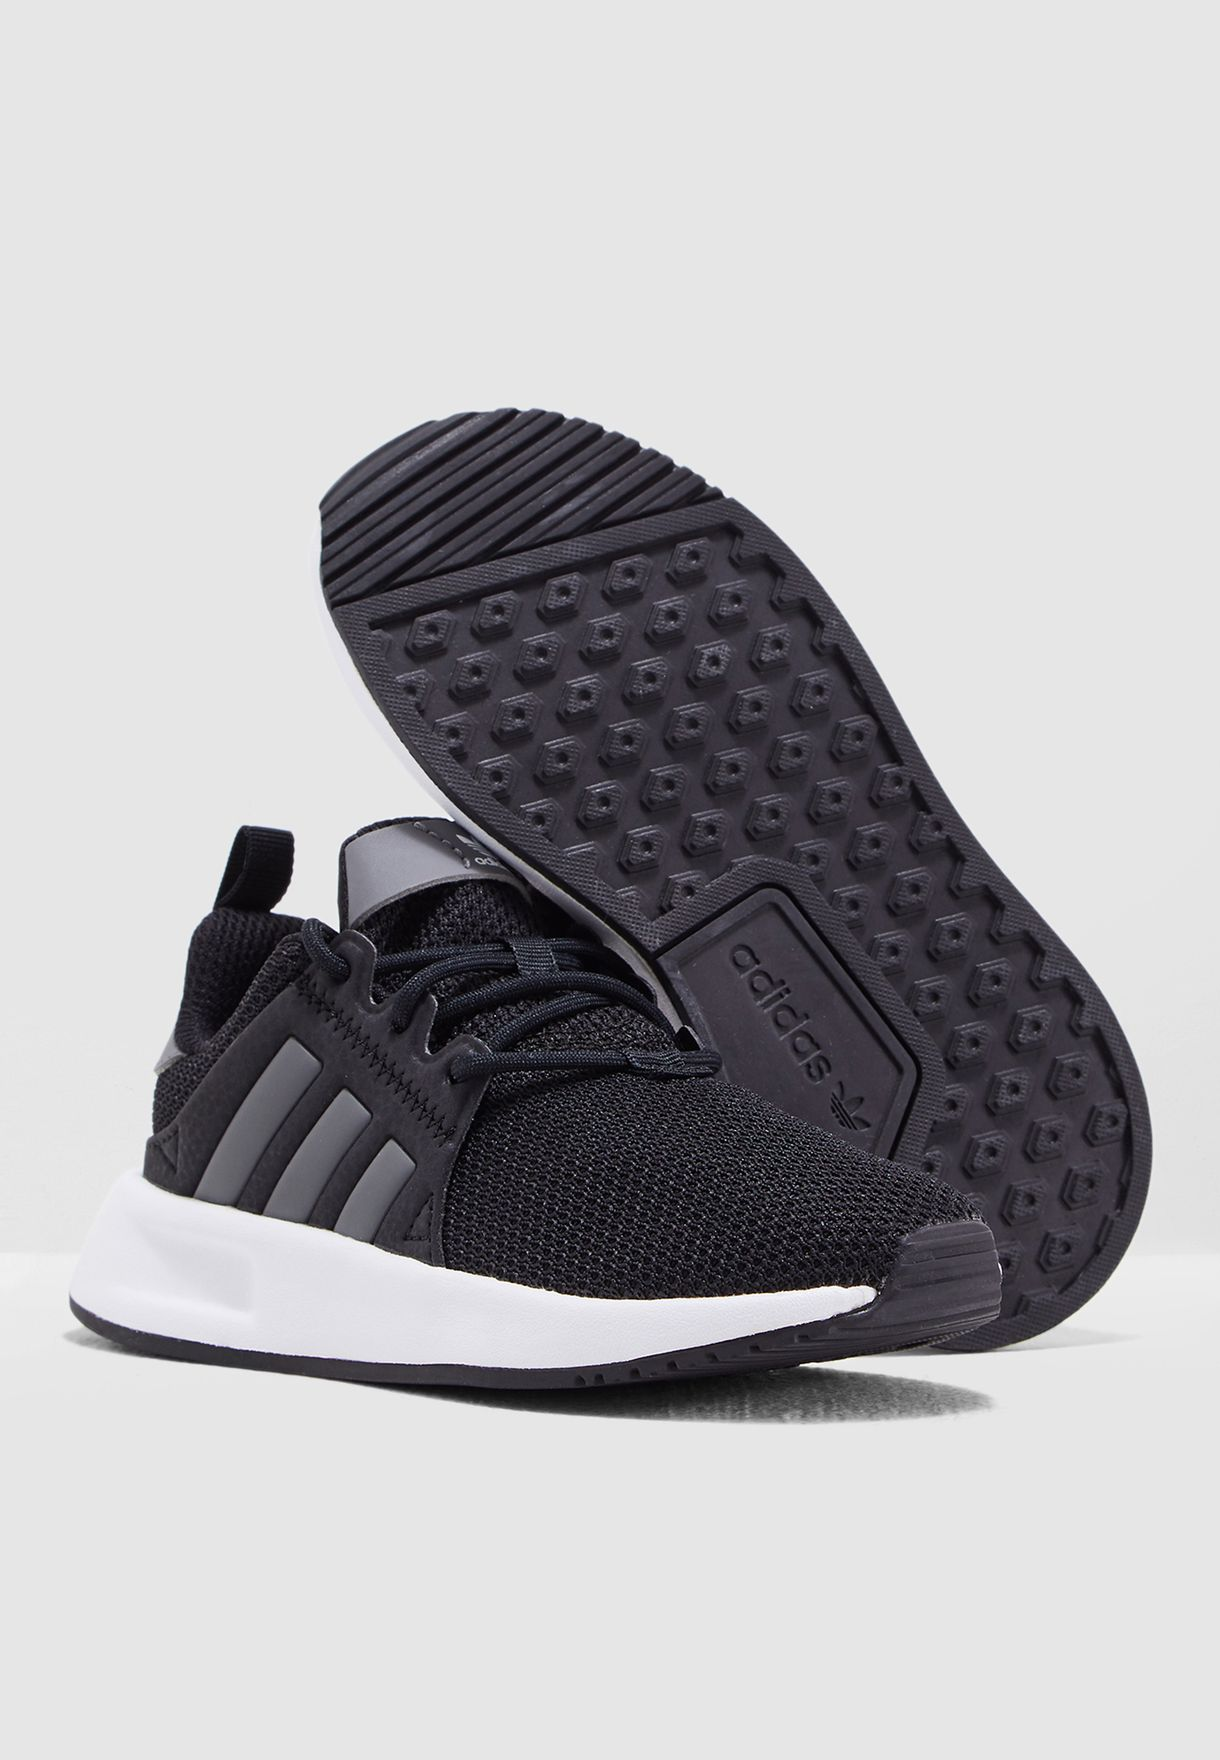 884b4bb7e88581 Shop adidas Originals black Kids X PLR CG6830 for Kids in Saudi ...